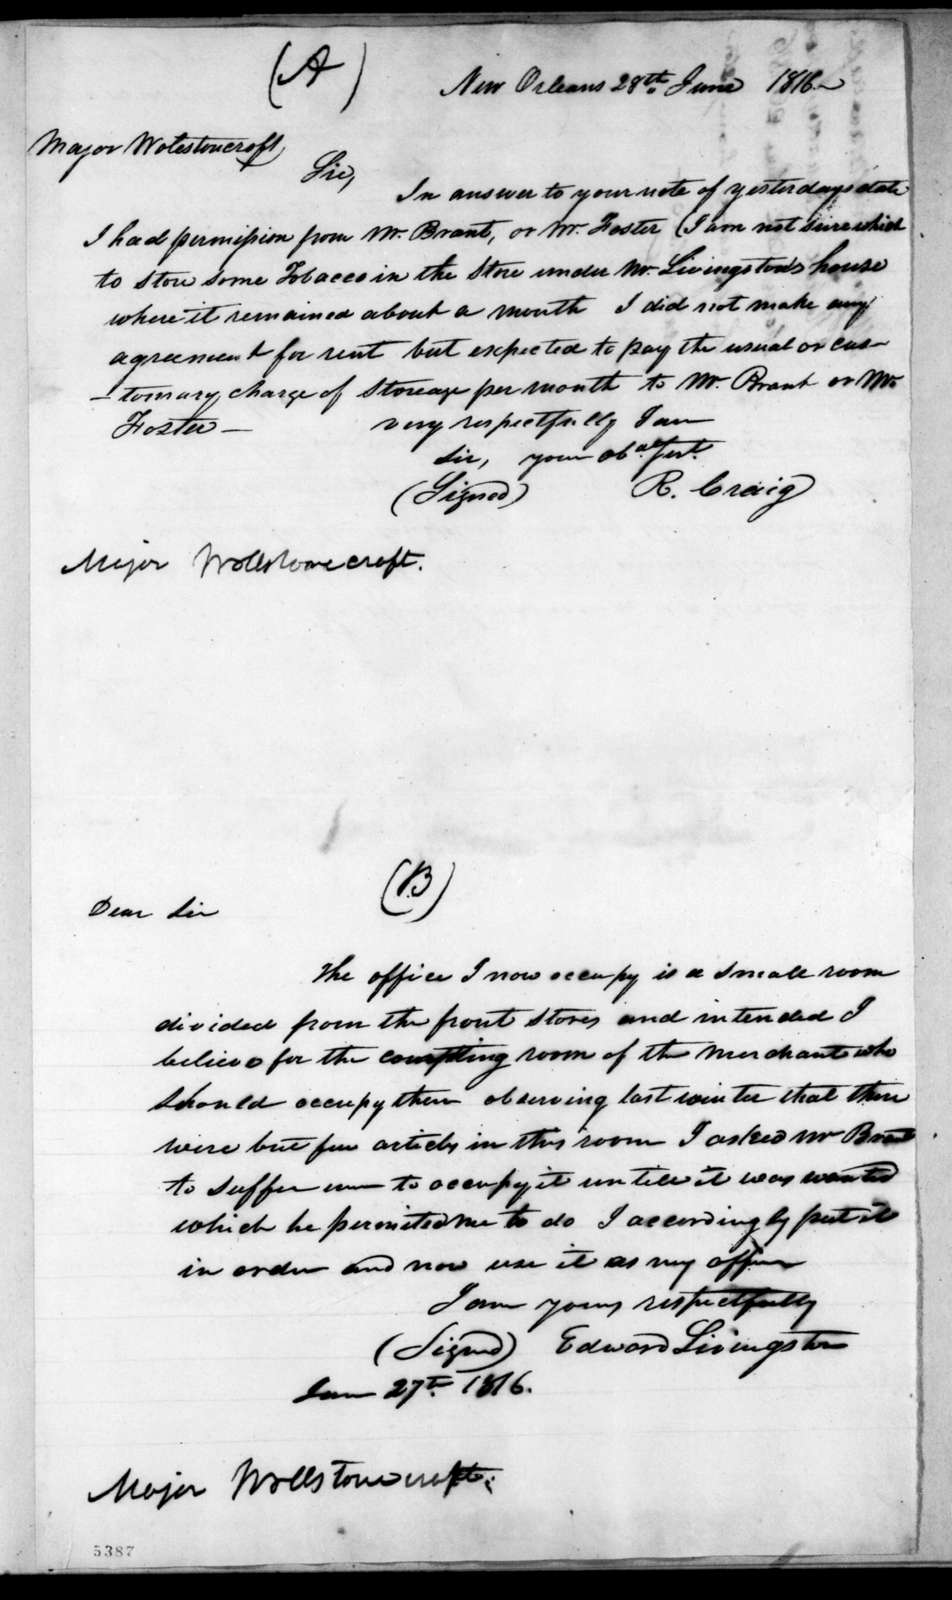 Rowland Craig to Charles Wollstonecraft, June 28, 1816